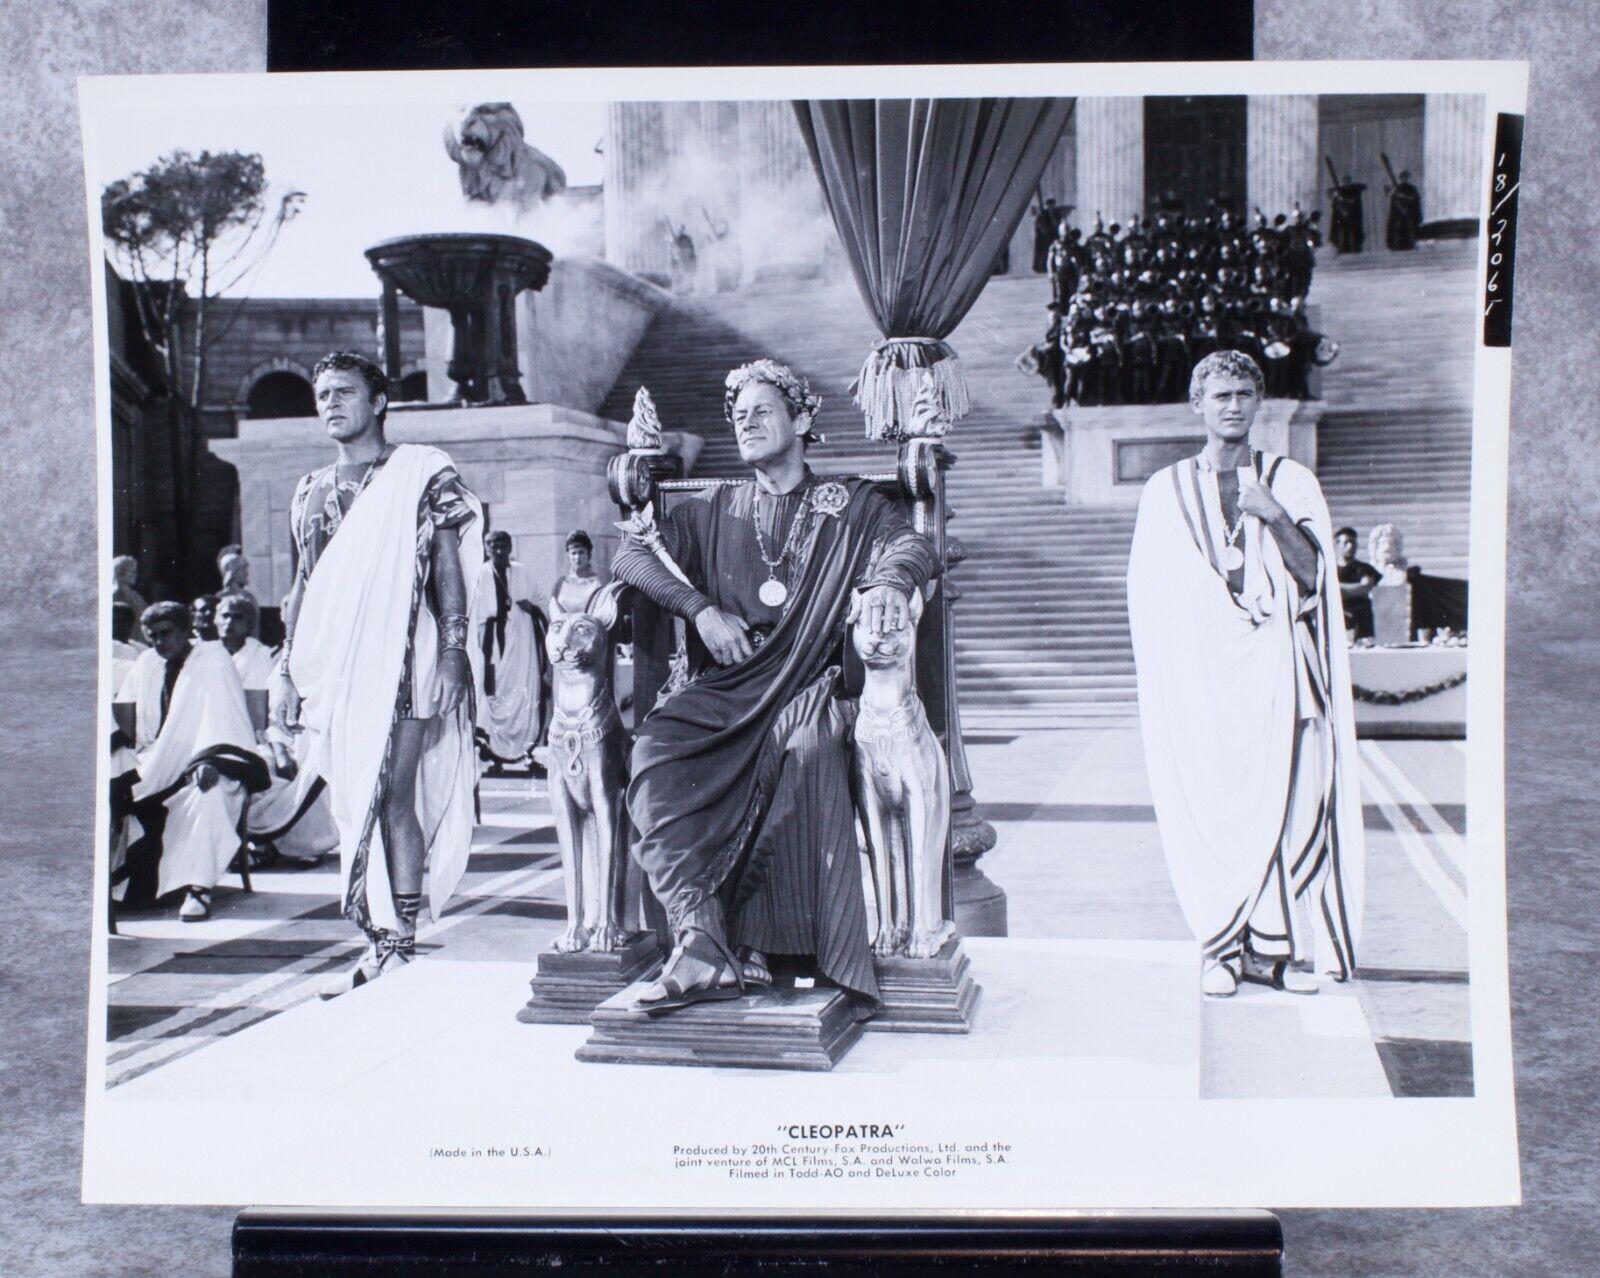 Cleopatra Original Photograph 1963 Richard Burton And Rex Harrison  - $20.00